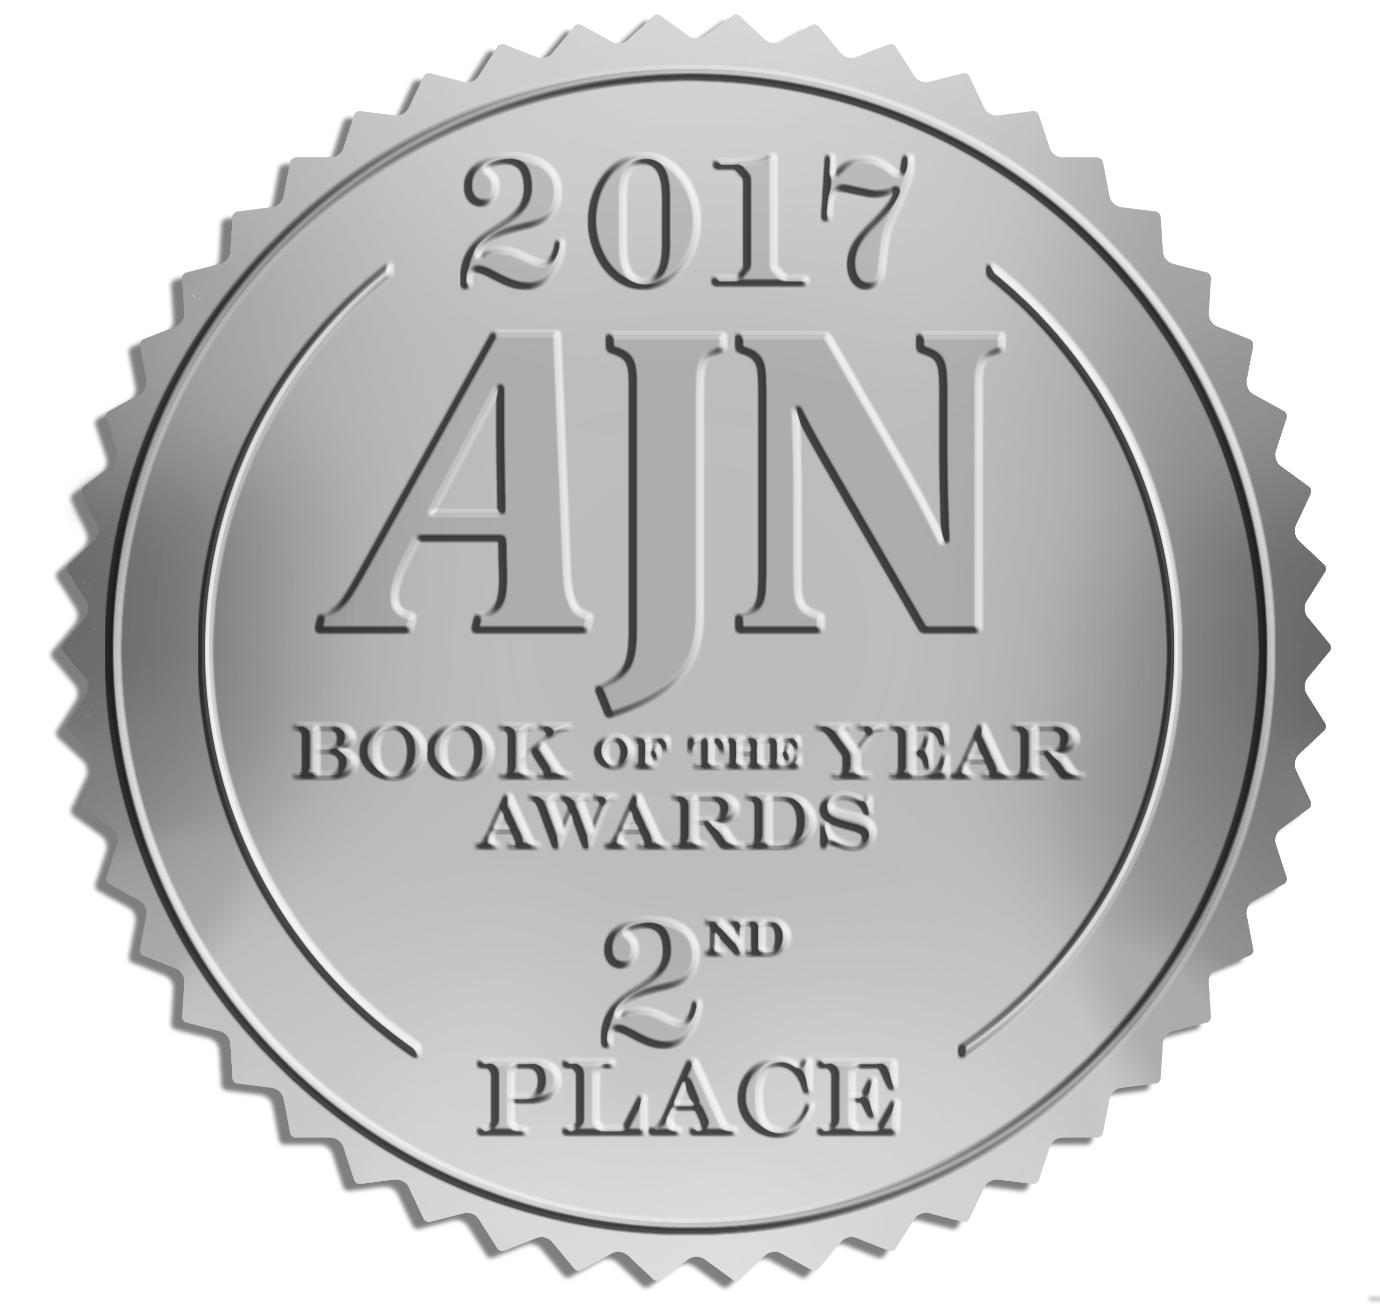 home care nursing surviving in an everchanging care environment 2017 ajn award recipient